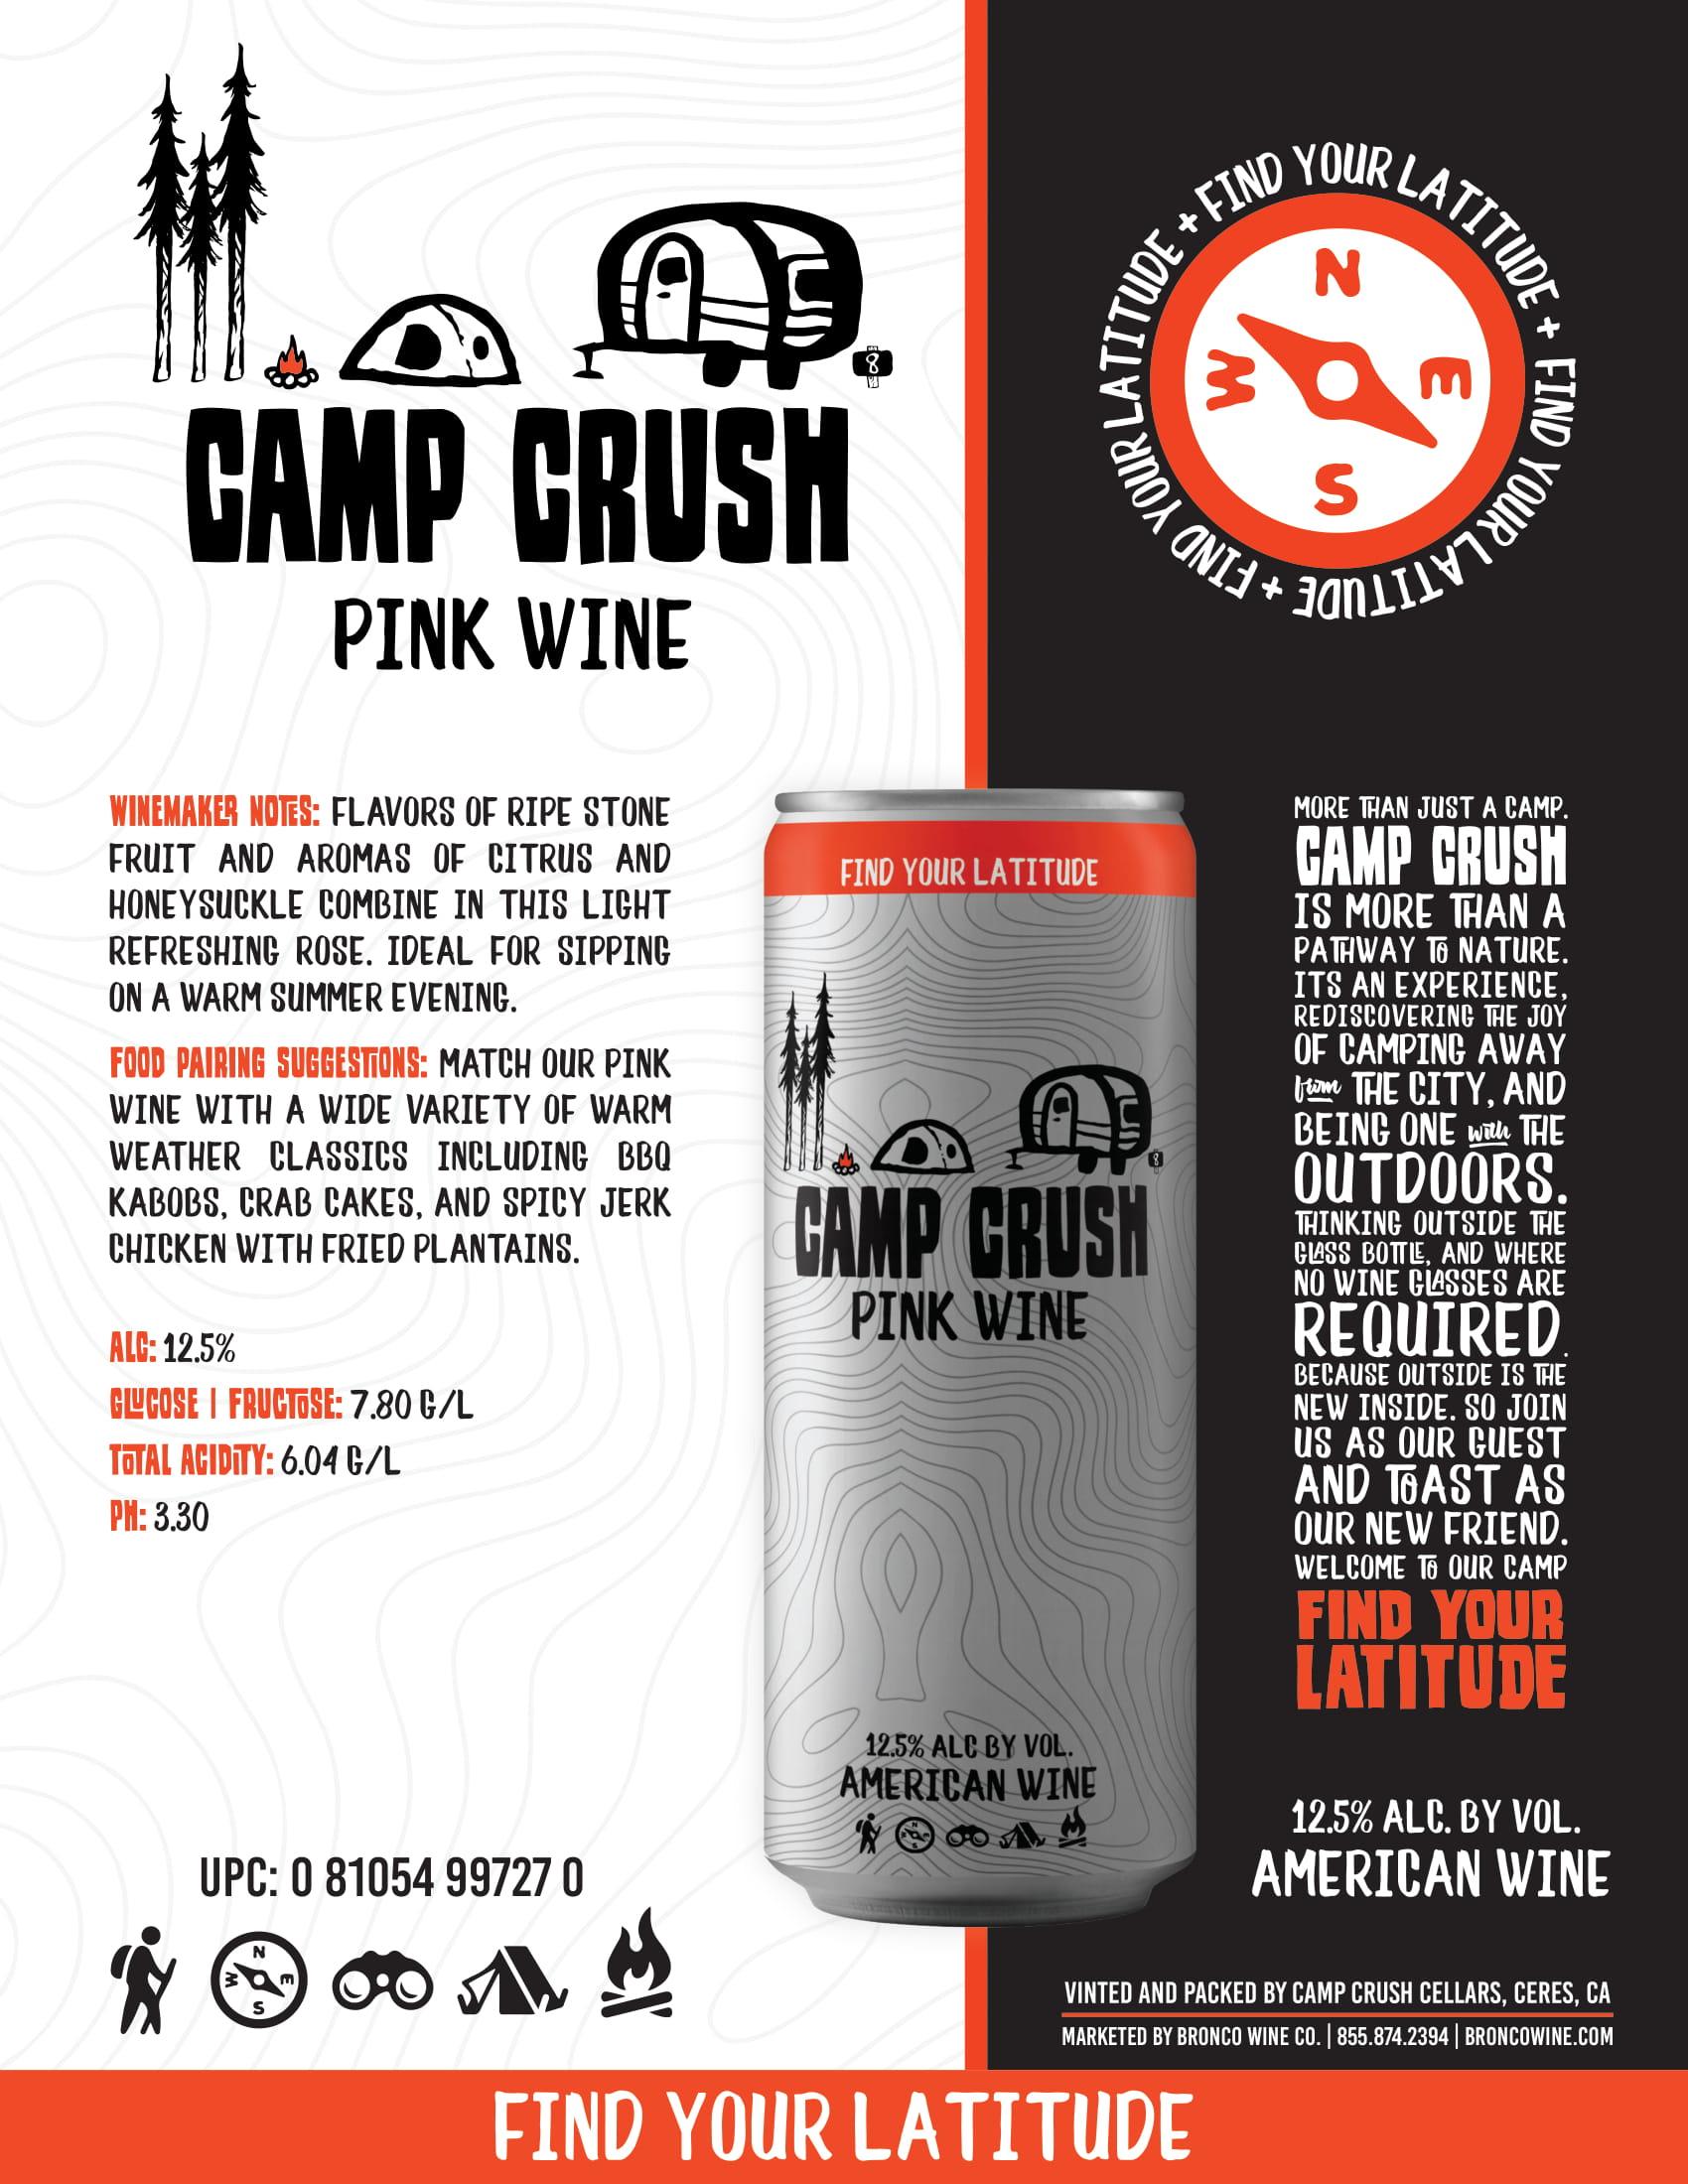 Camp Crush Pink Wine Sell Sheet